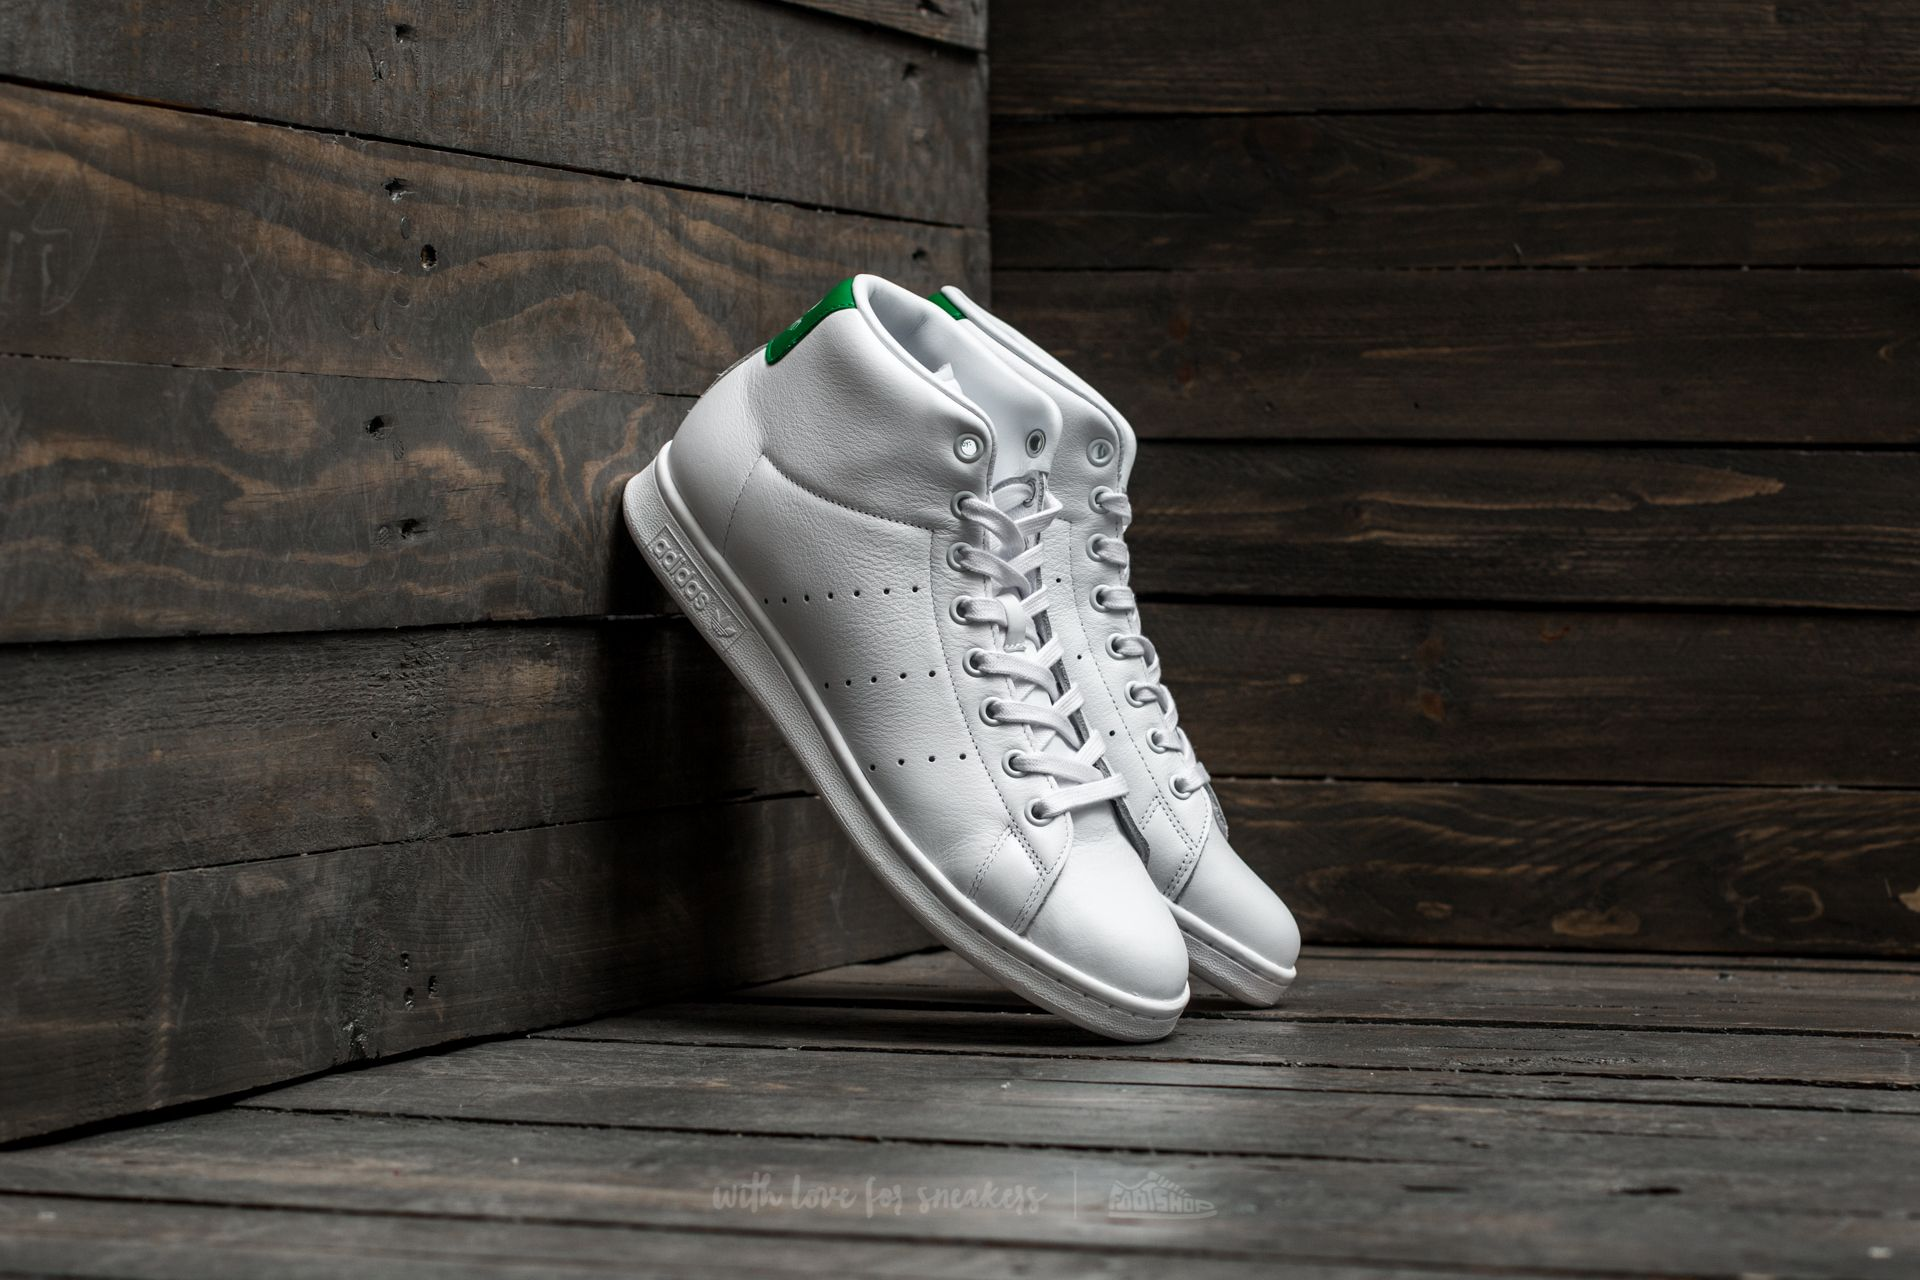 adidas Stan Smith MID Footwear White Footwear White Green | Footshop